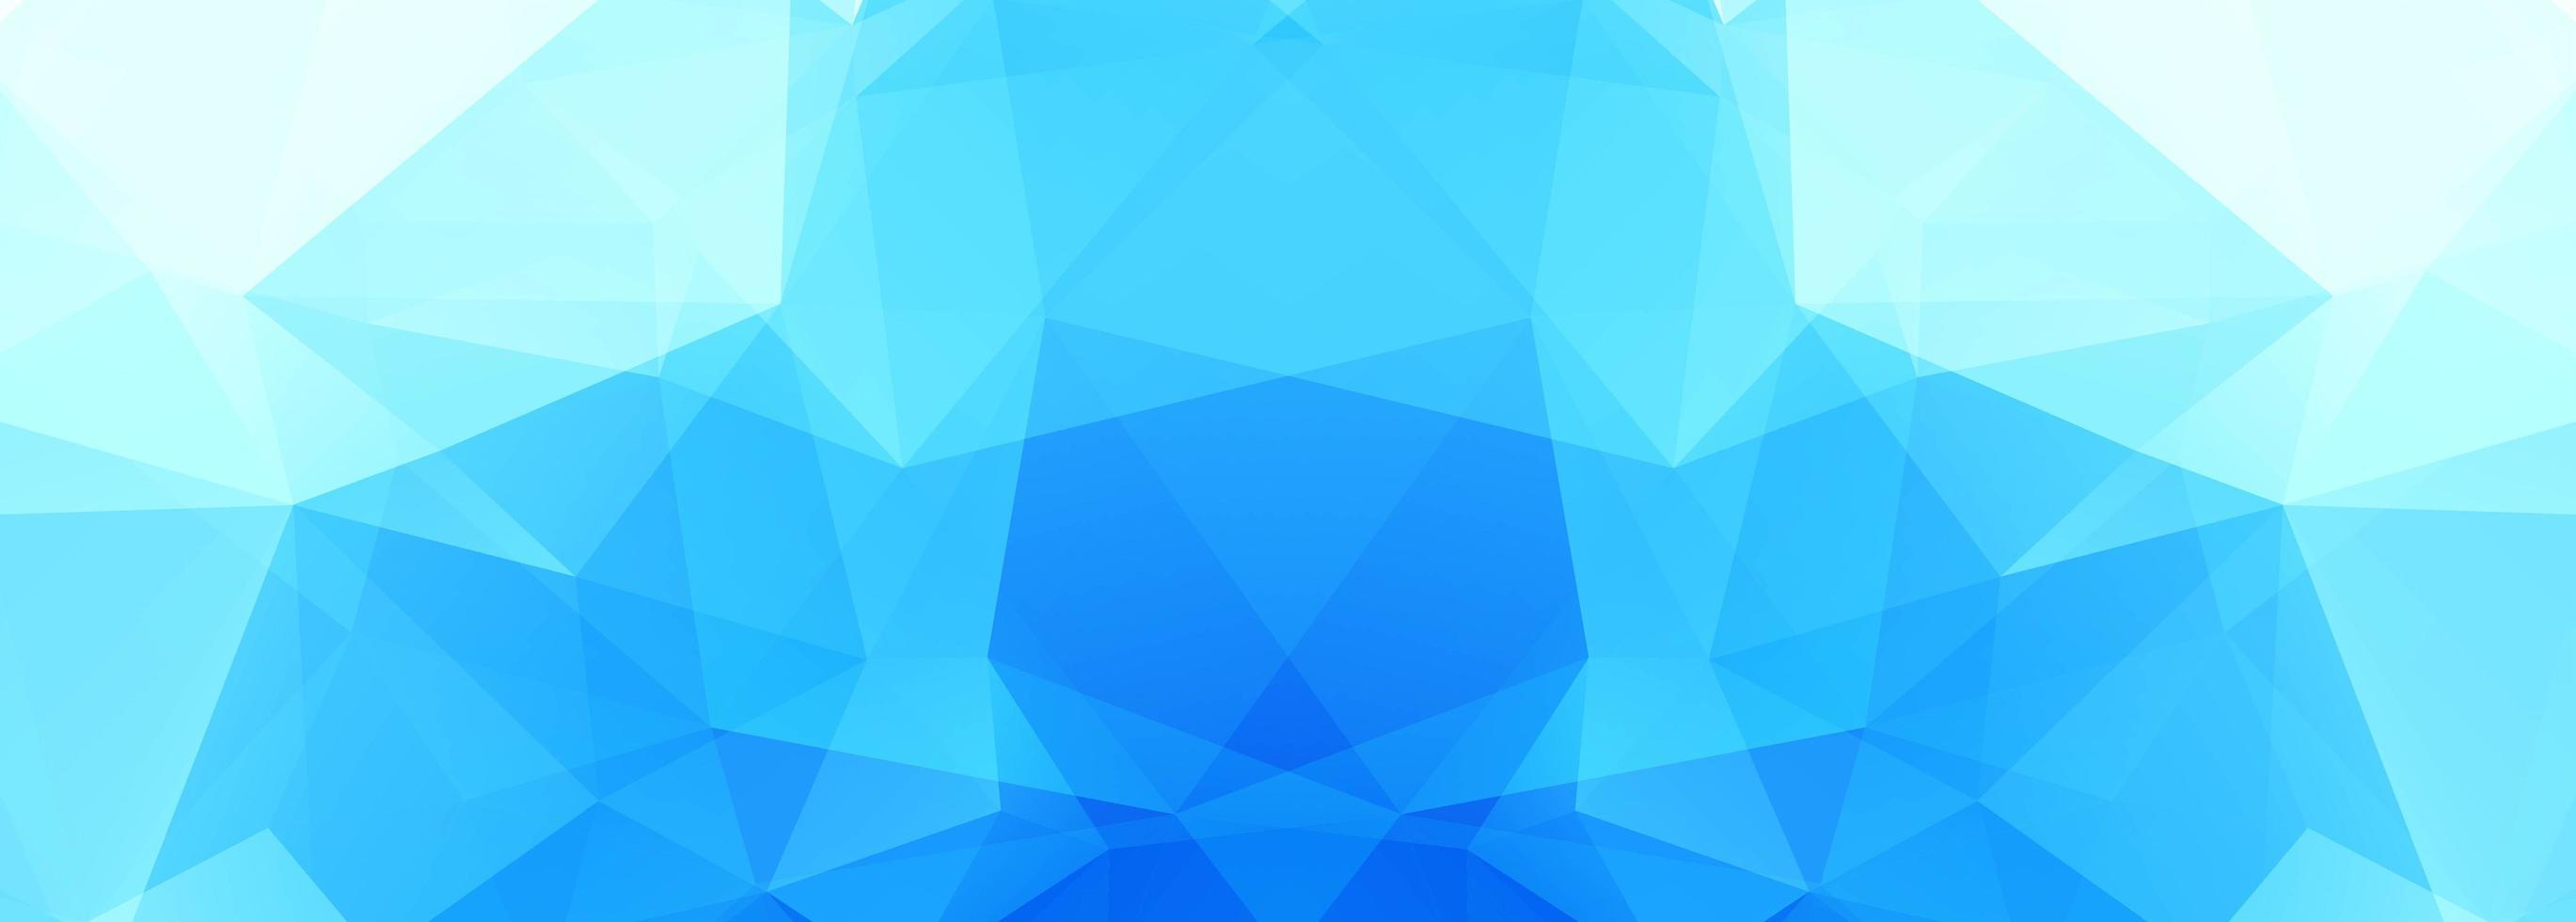 banner moderno poligono blu vettore